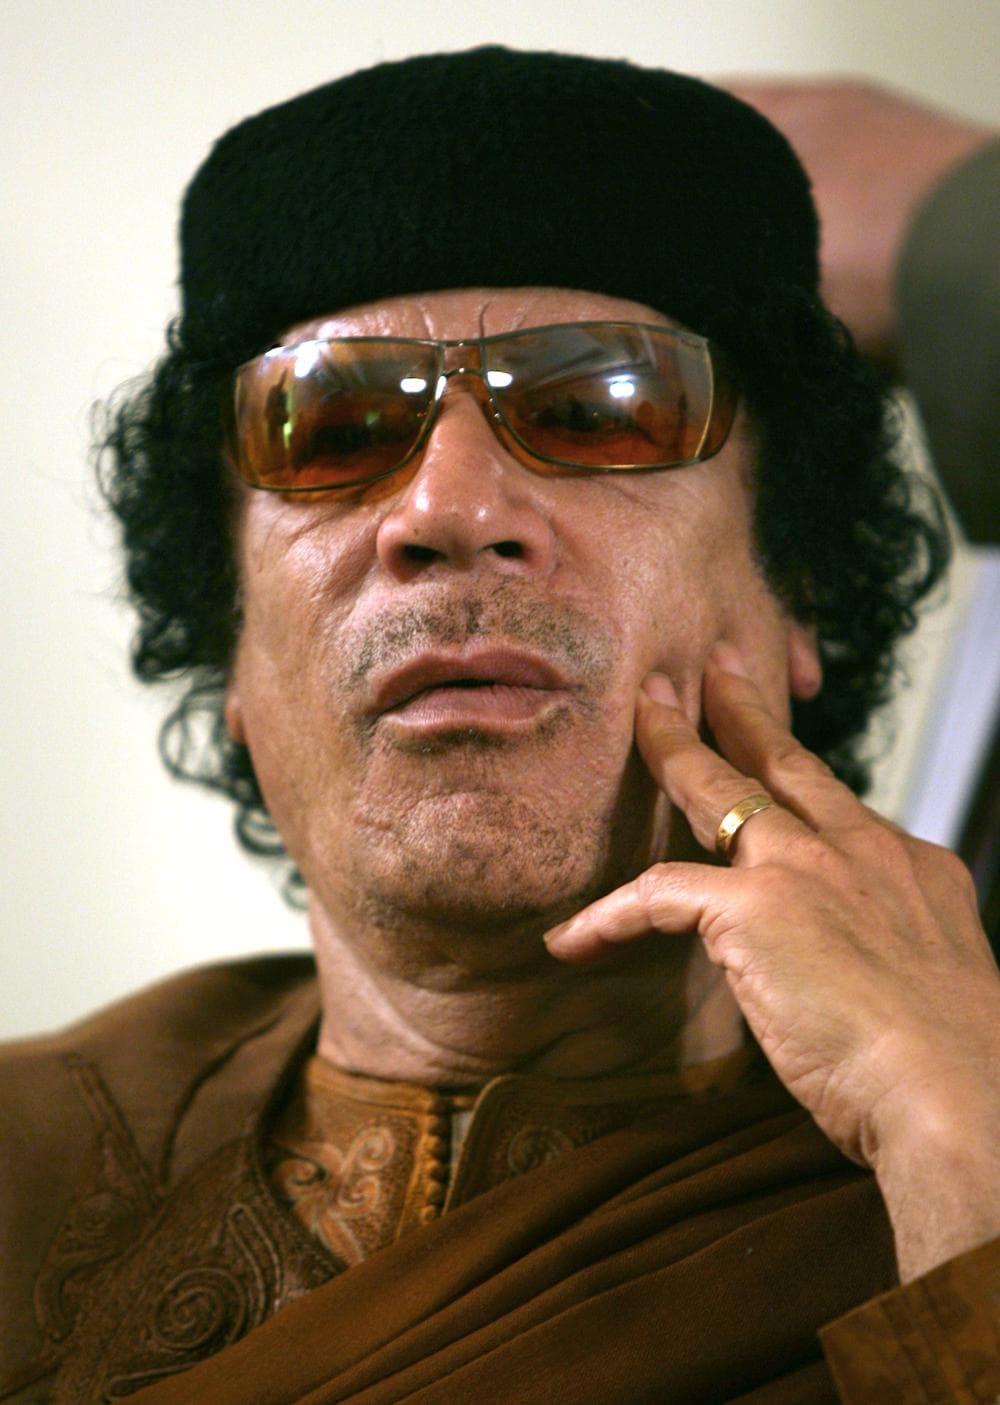 Libya's Moammar Gadhafi in 2007. (AP)